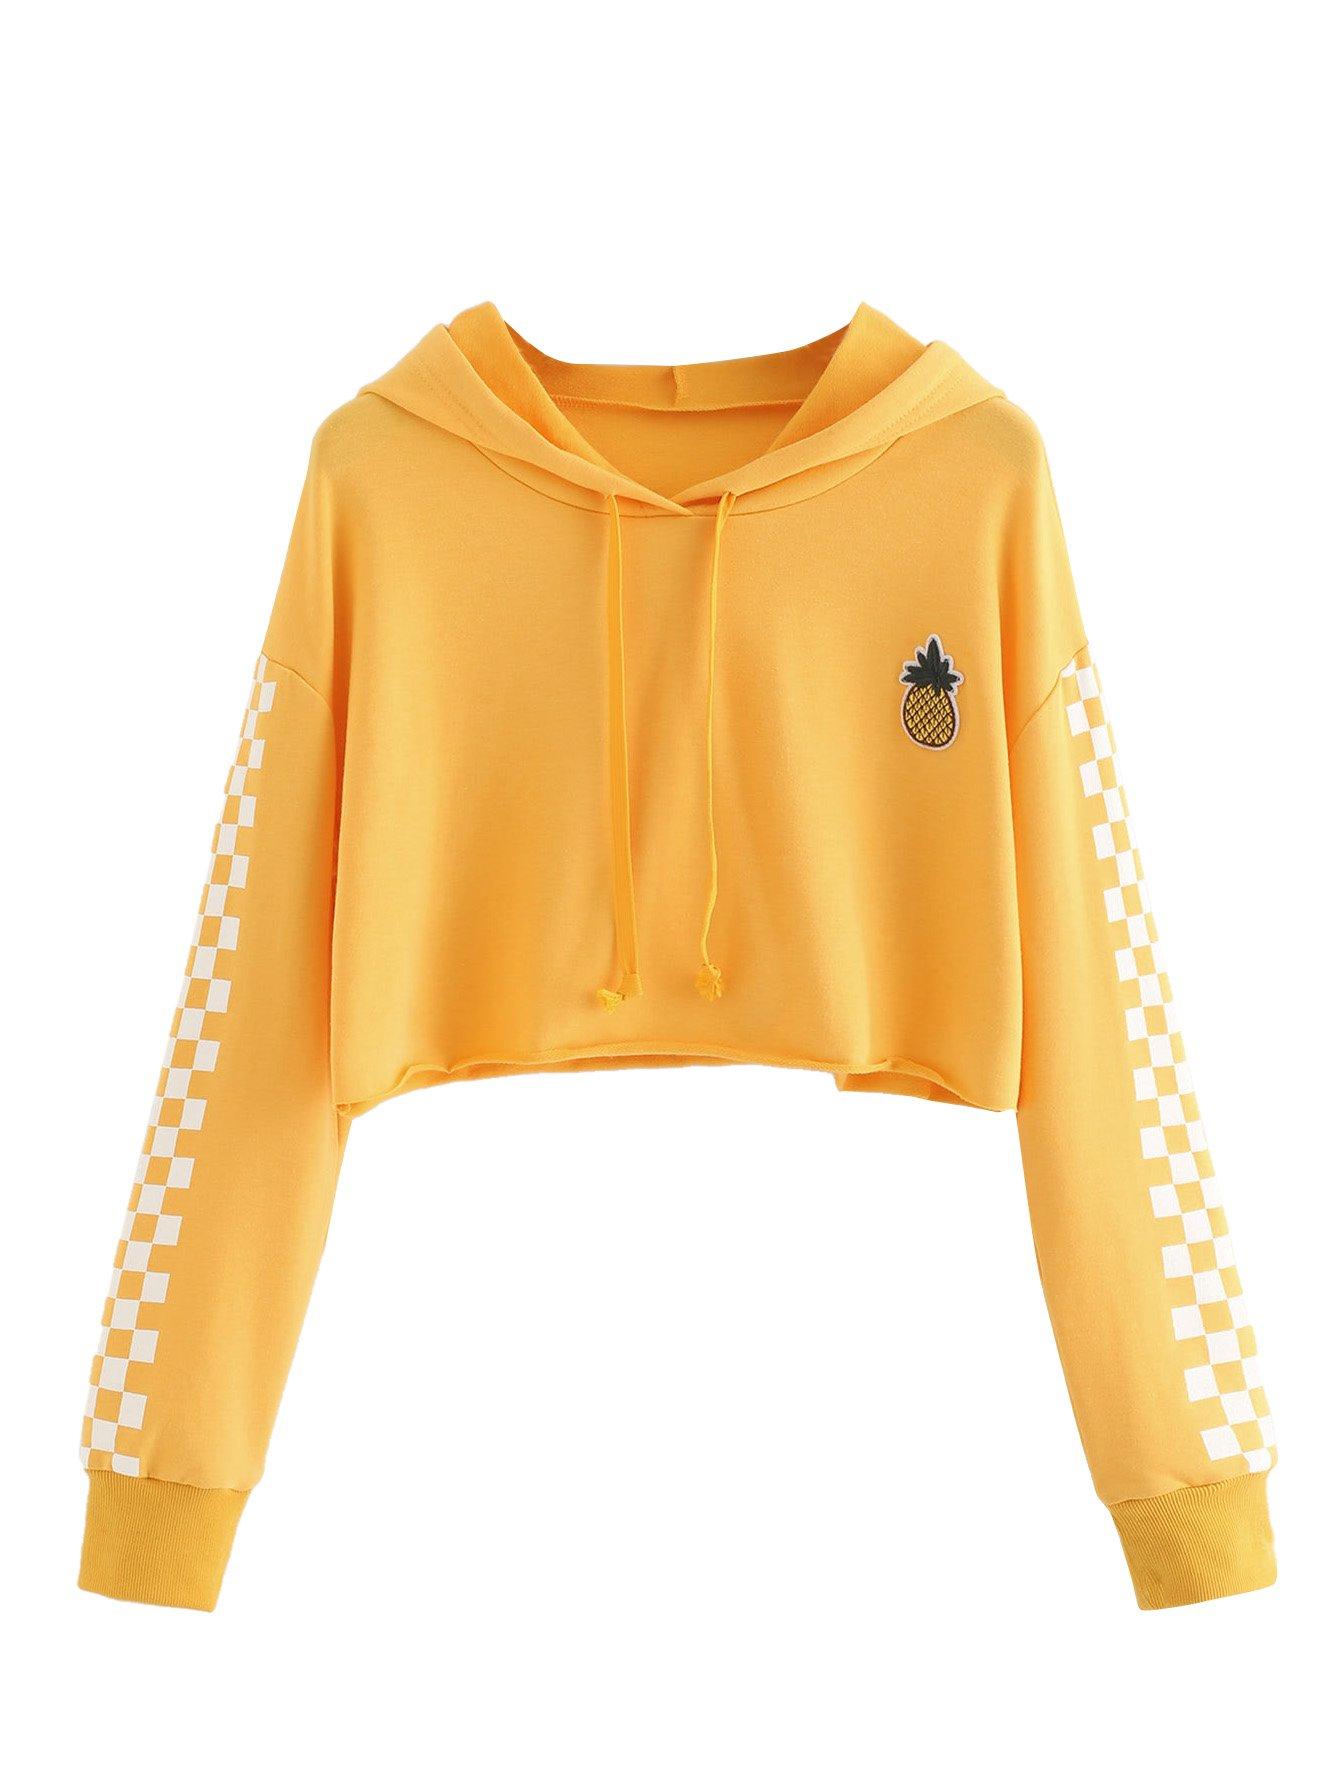 MakeMeChic Women's Pineapple Embroidered Hoodie Plaid Crop Top Sweatshirt Yellow M